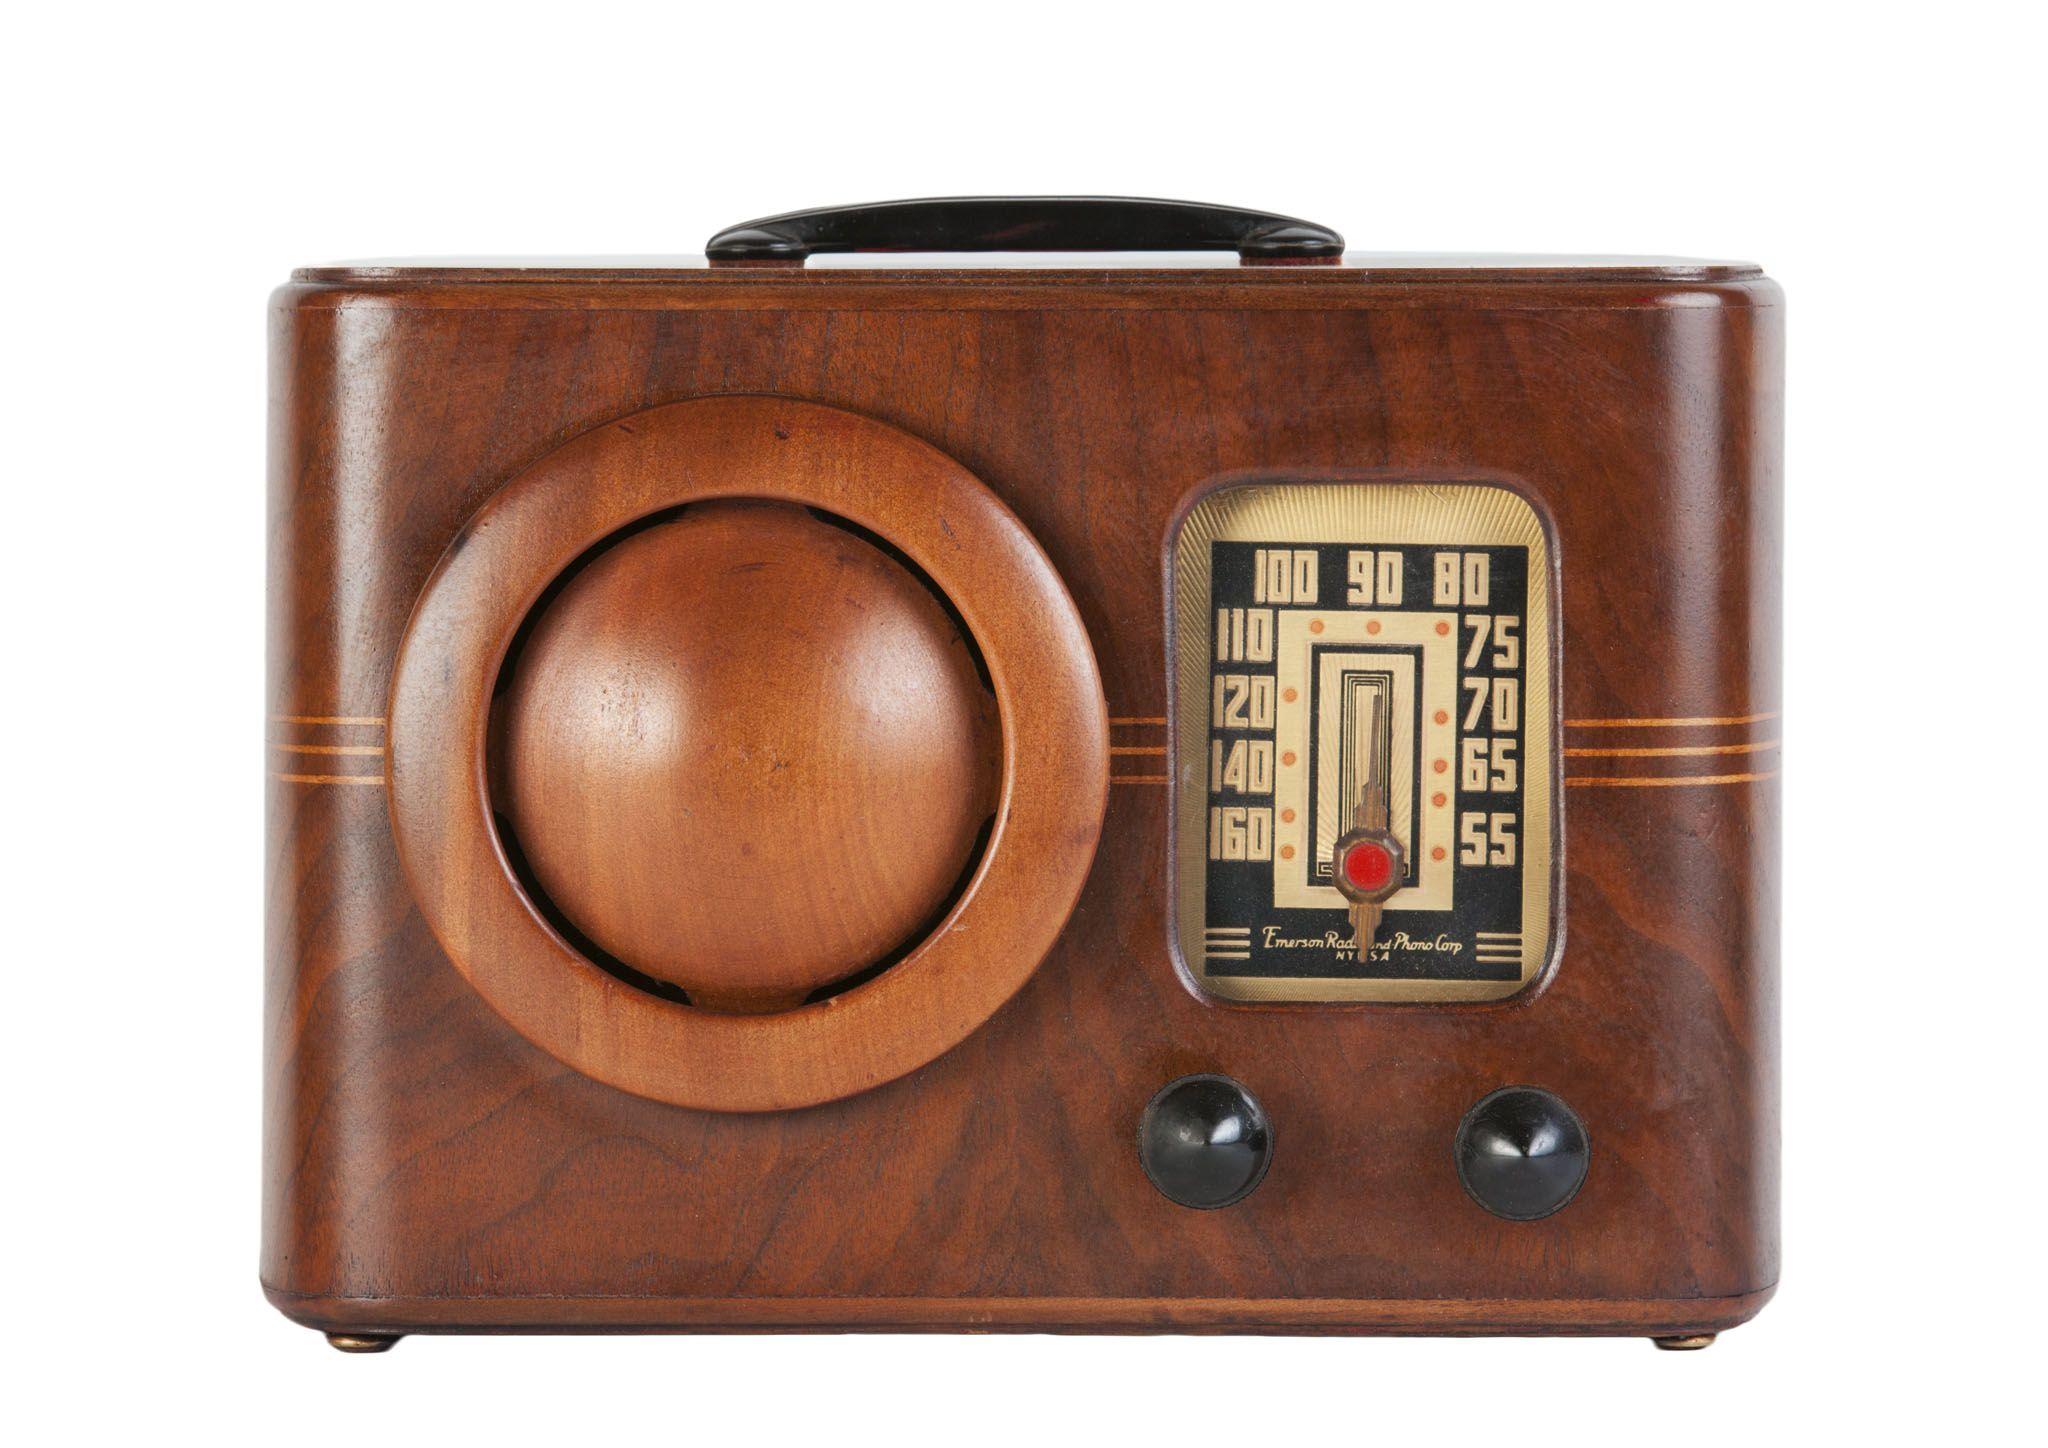 1939 Emerson Db 315 Circle Grille Radio Usa Vintage Radio Antique Radio Retro Radios